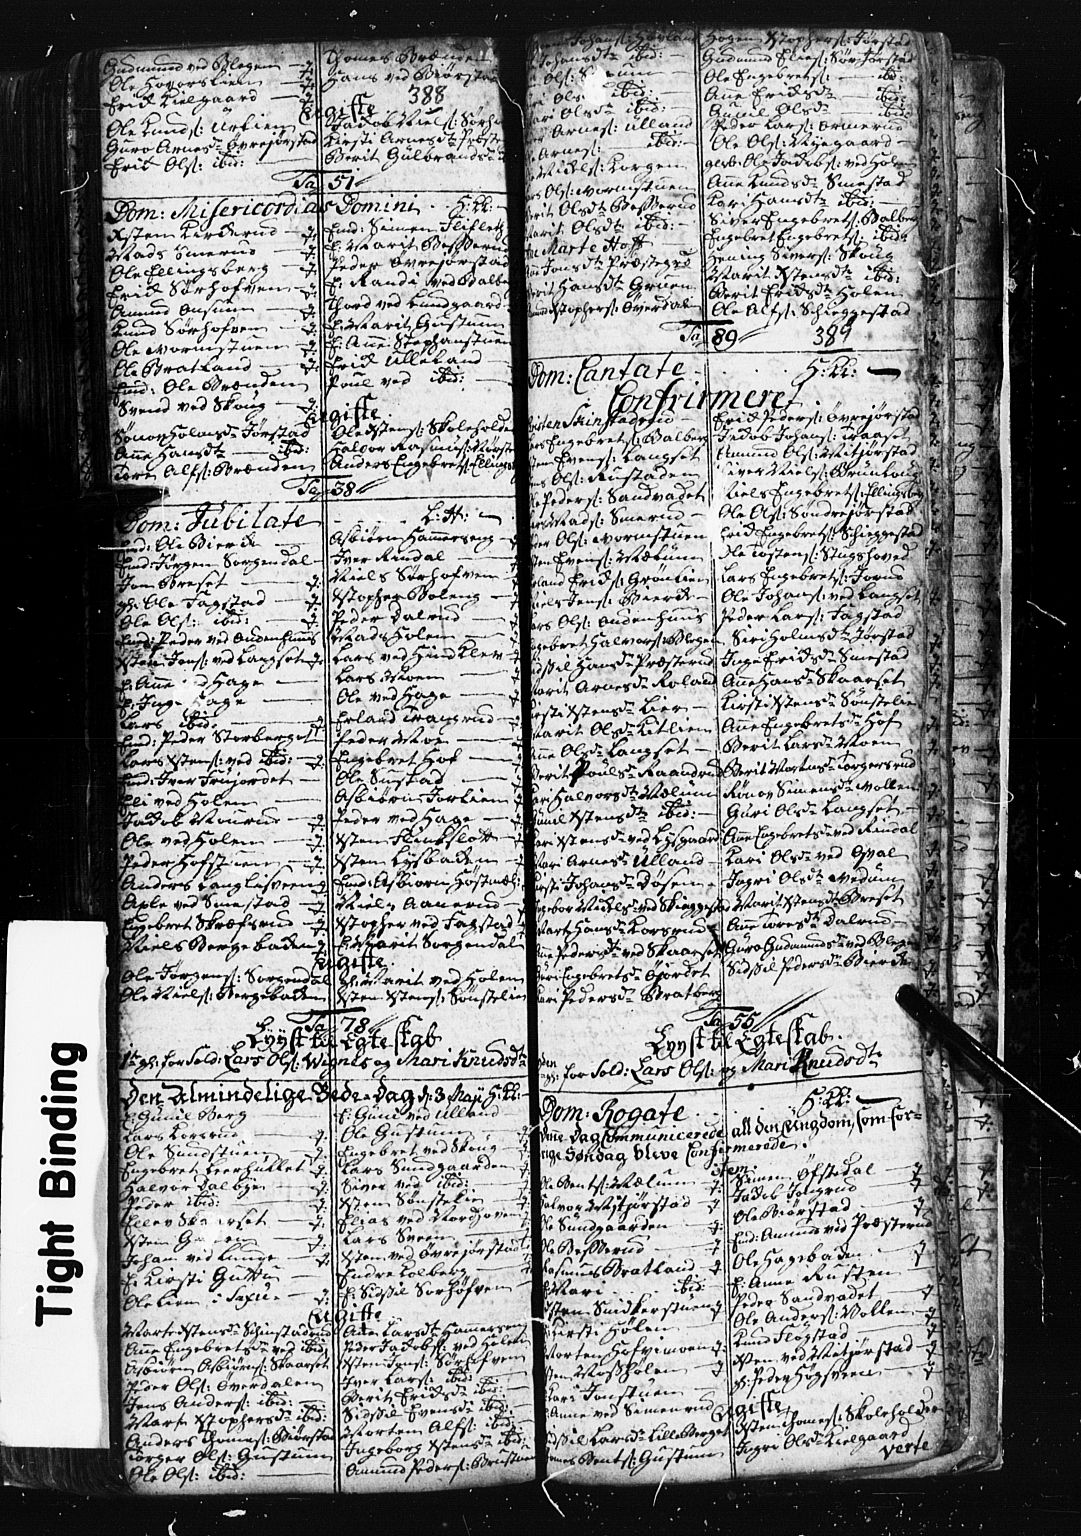 SAH, Fåberg prestekontor, Klokkerbok nr. 1, 1727-1767, s. 388-389